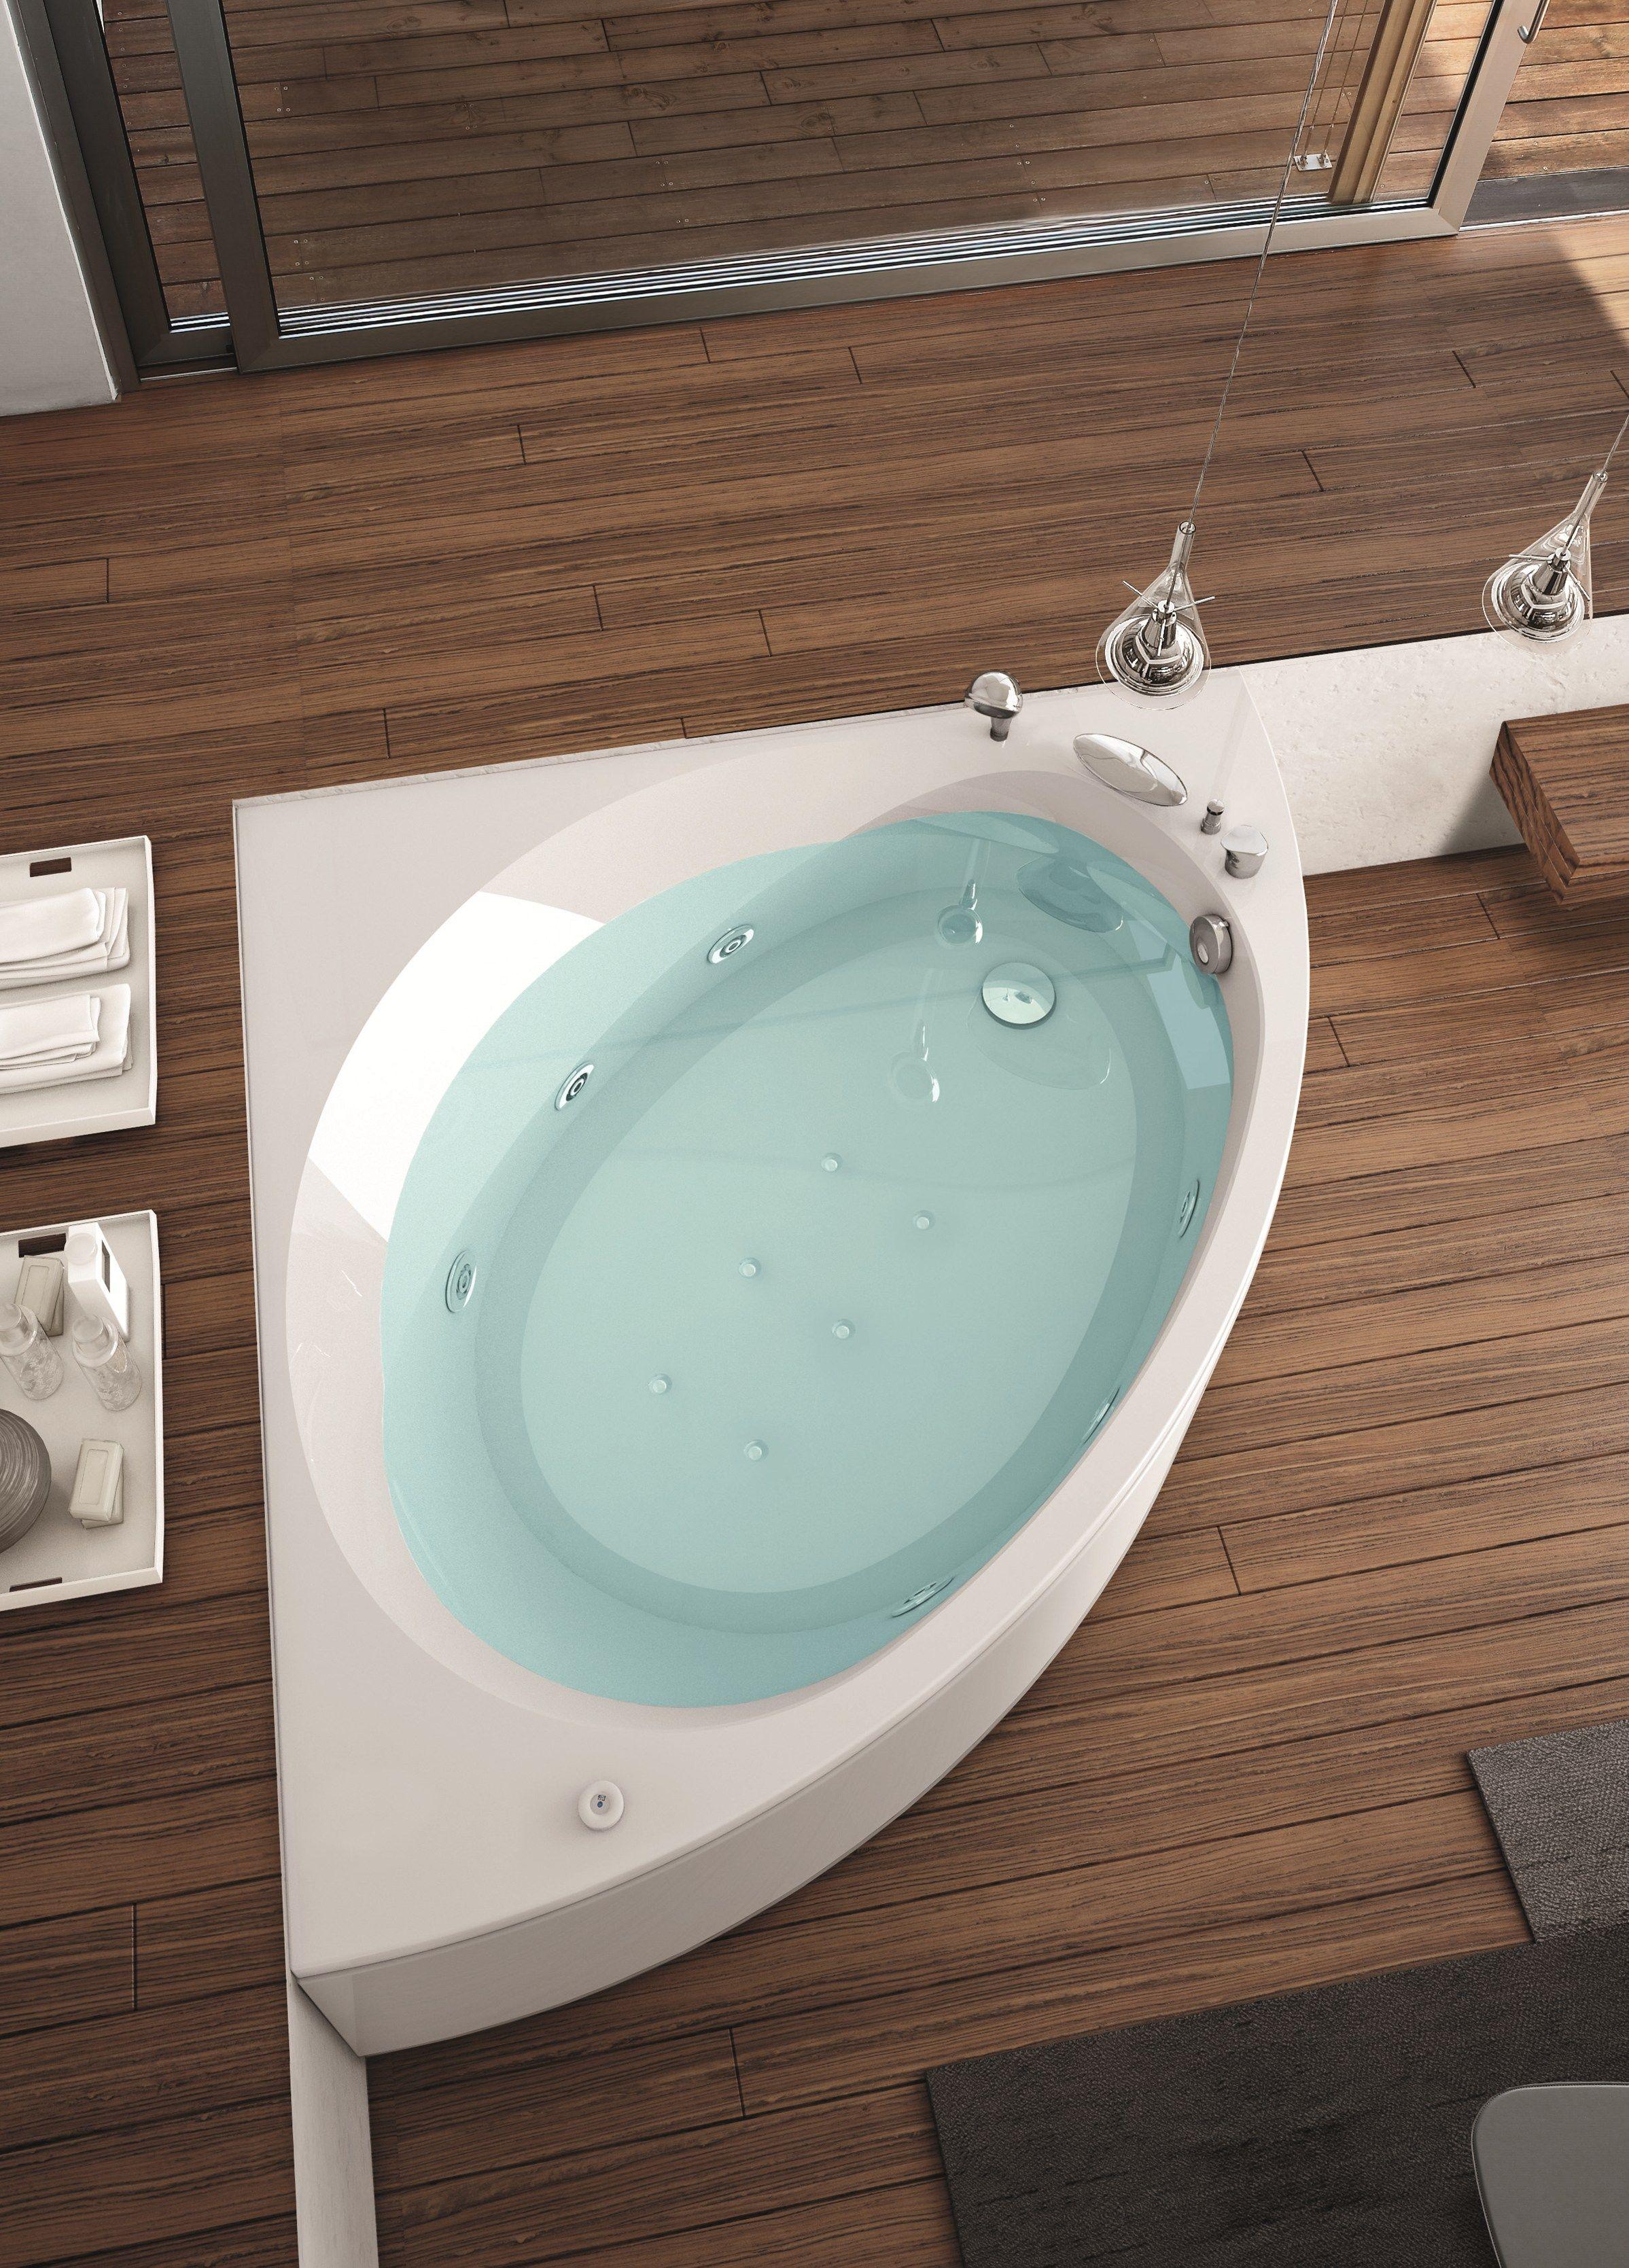 Badezimmer ideen whirlpool chiproductsenproductsnovacornerwhirlpool